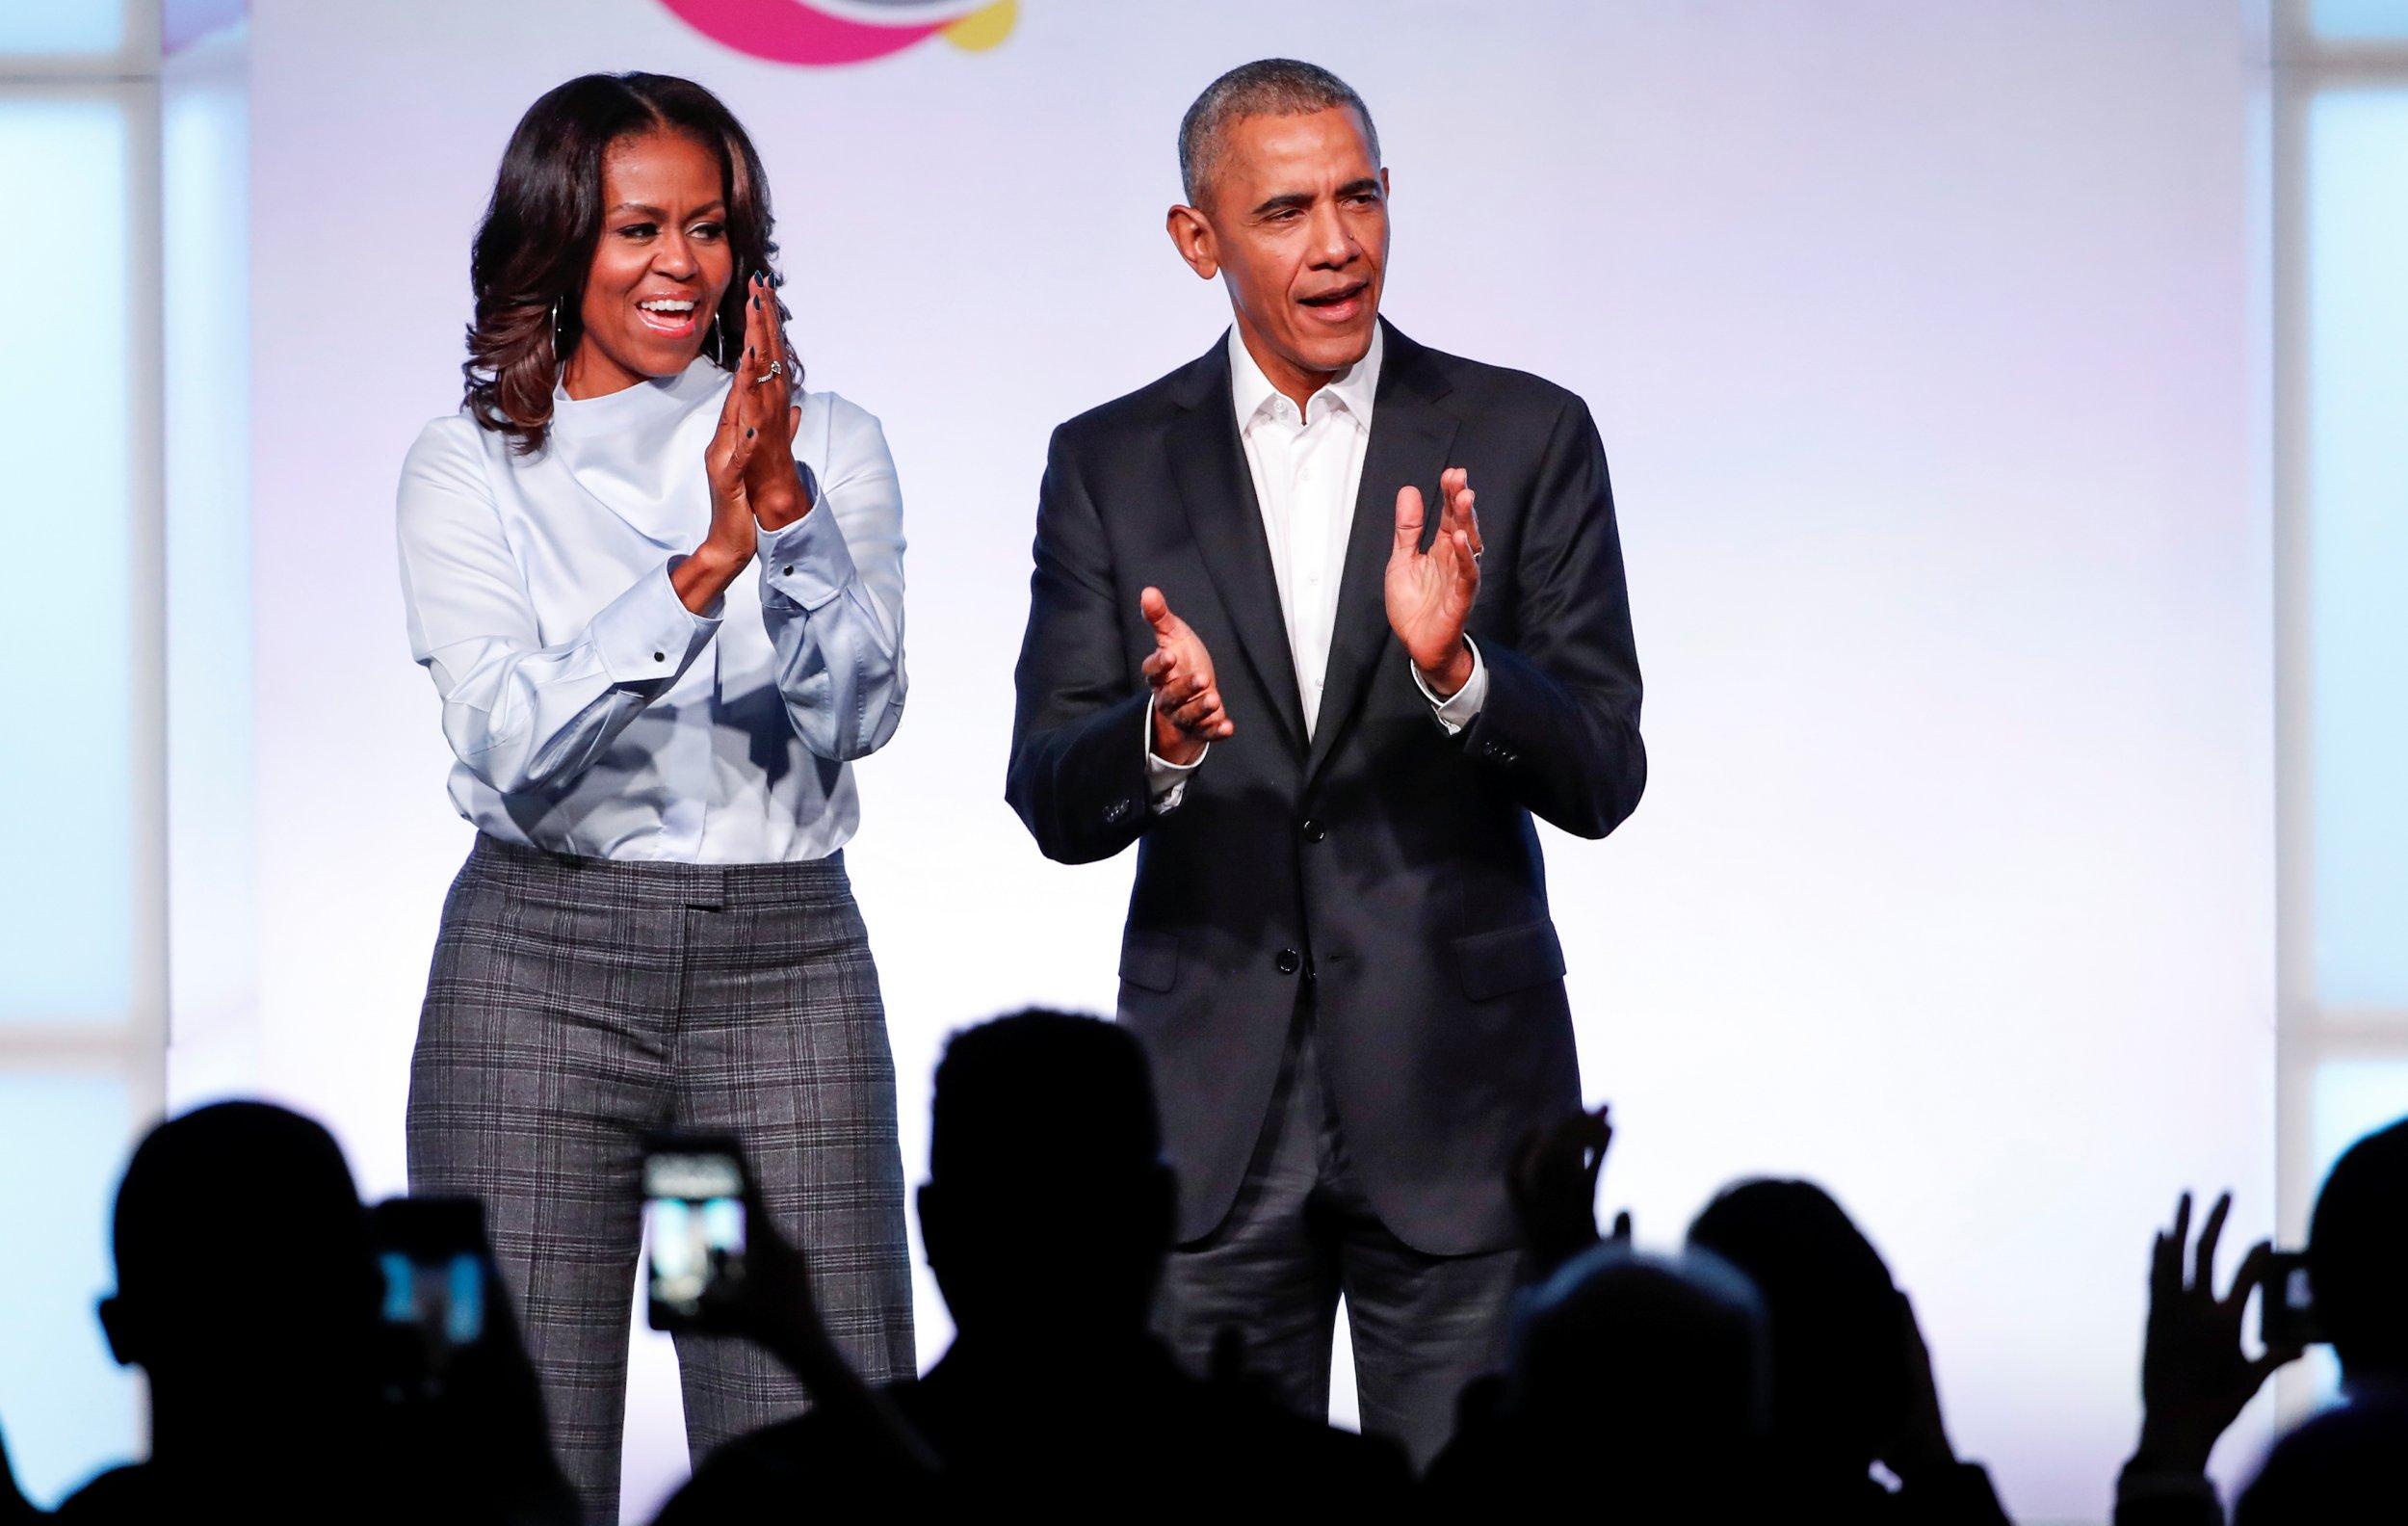 Barack Obama's Thanksgiving tweet was 10 times more popular than Donald Trump's